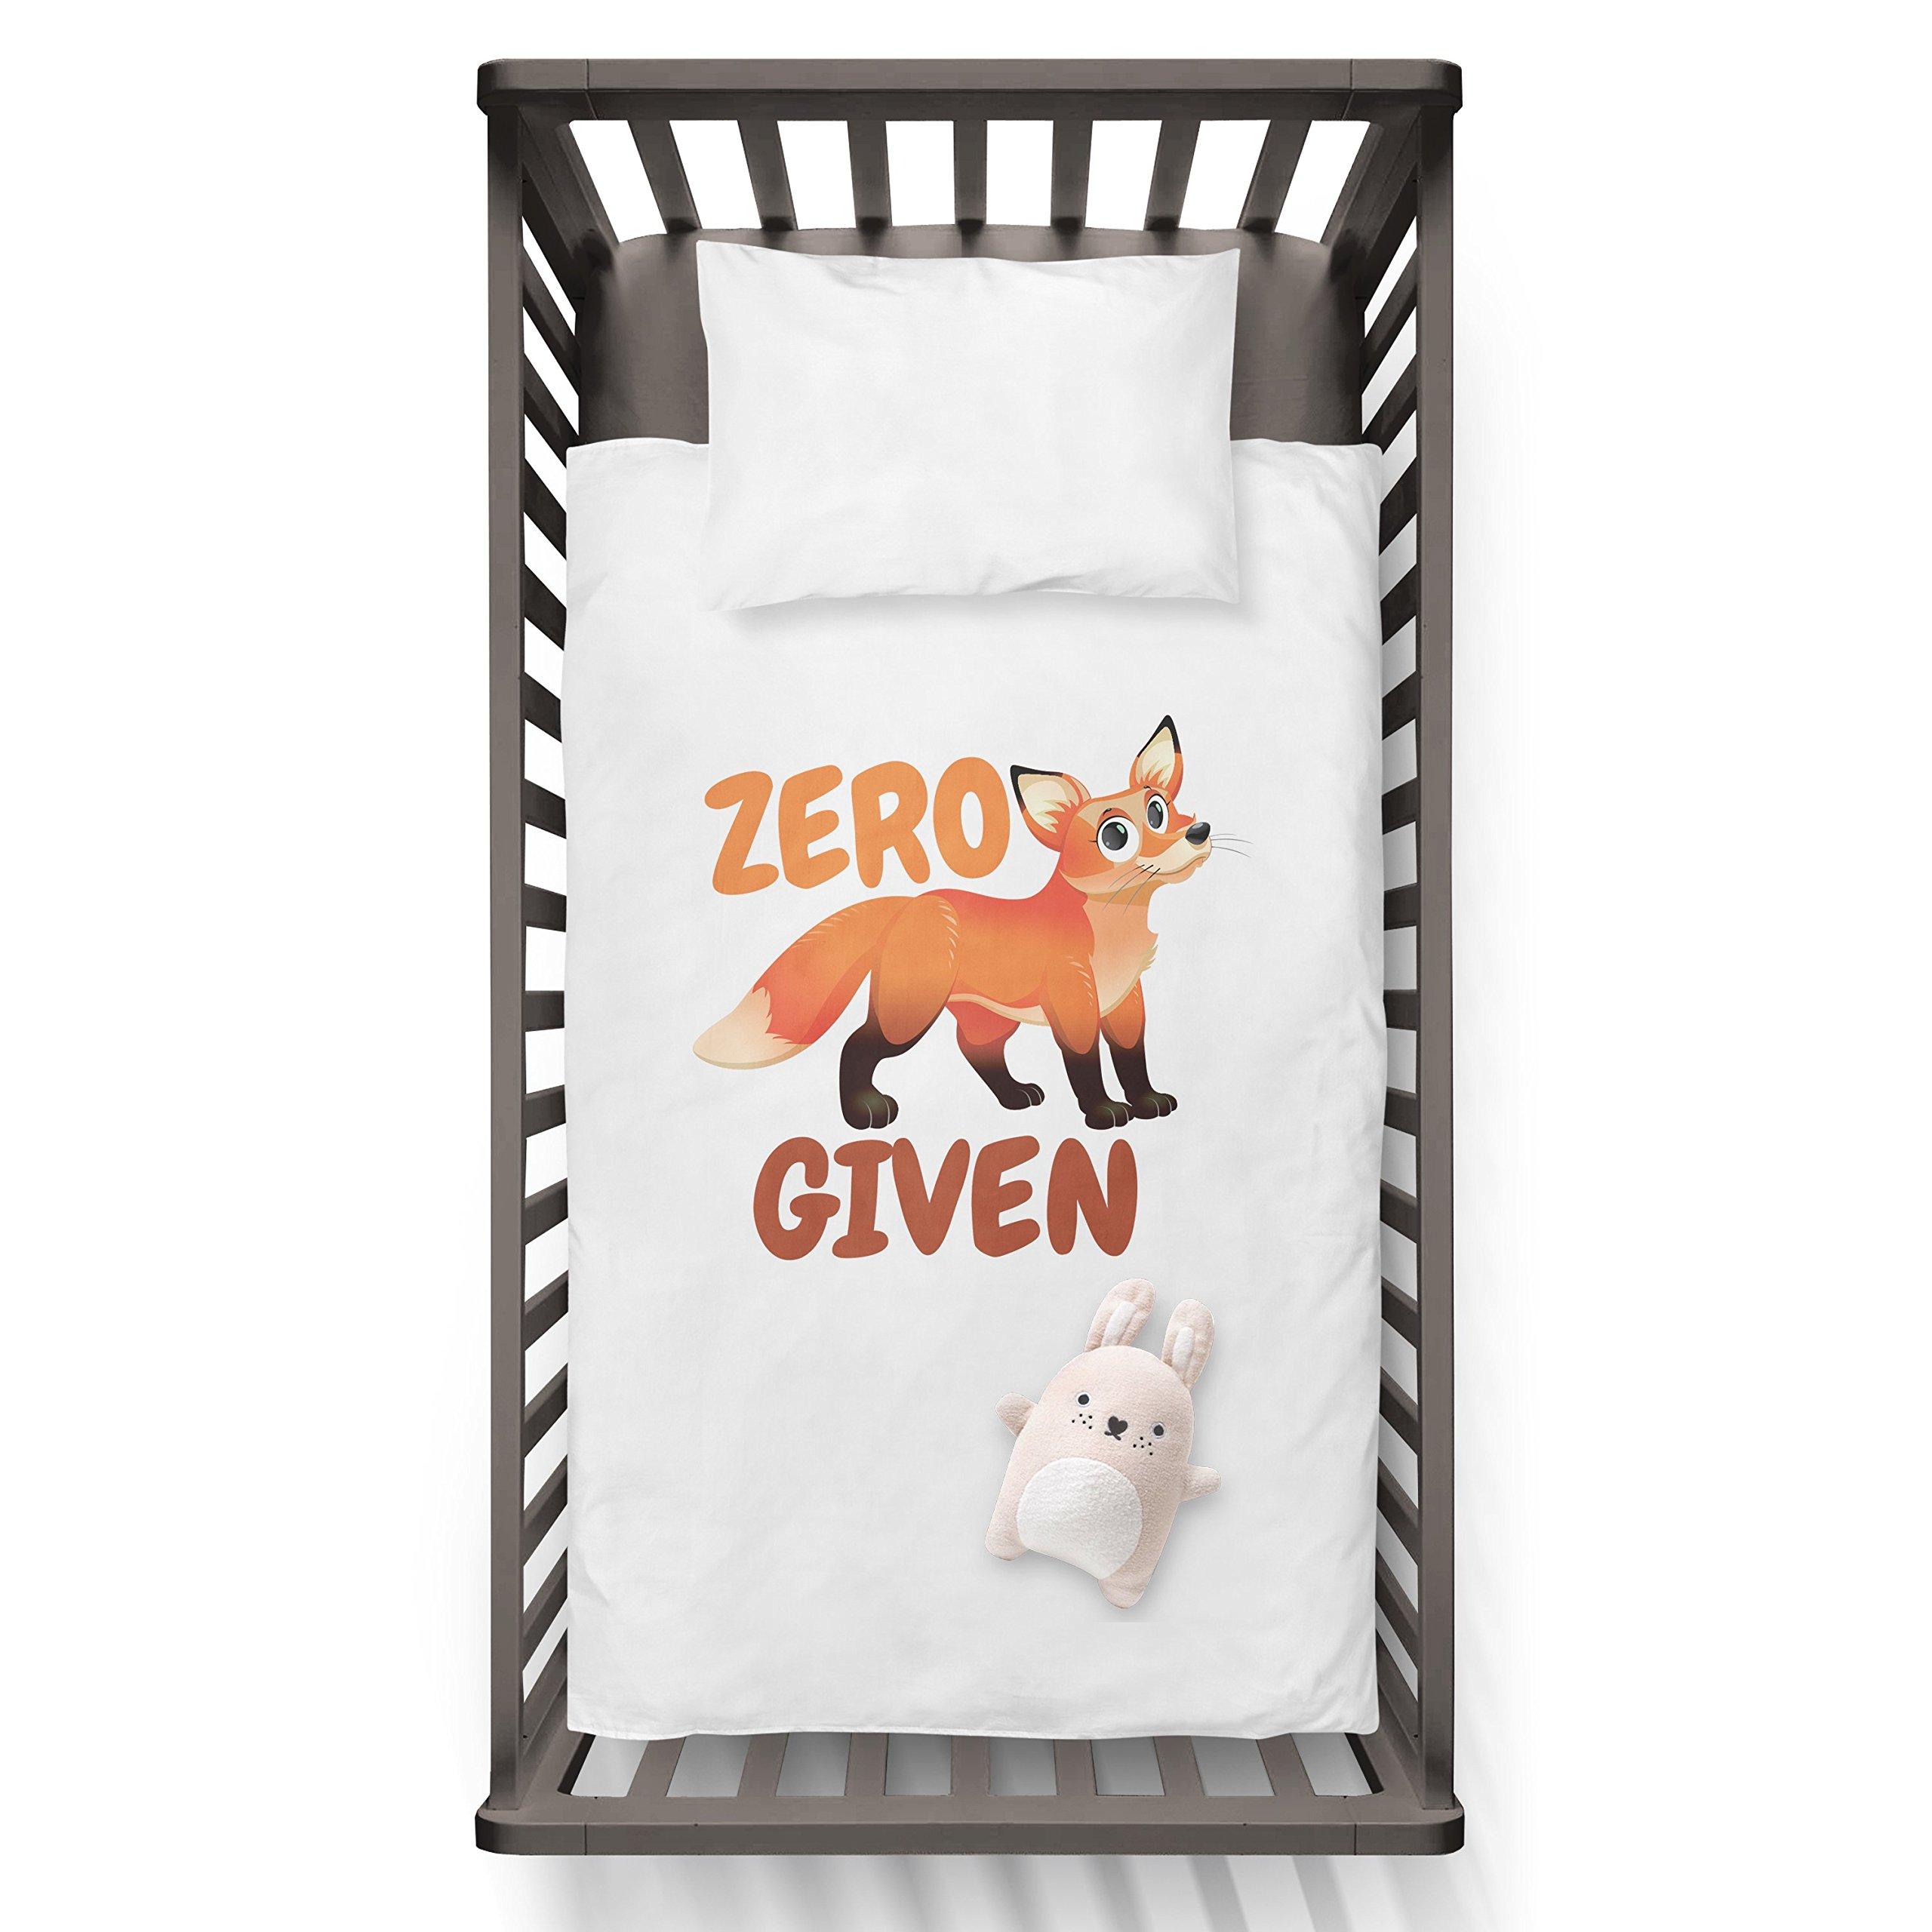 Zero Fox Given Funny Humor Hip Baby Duvet /Pillow set,Toddler Duvet,Oeko-Tex,Personalized duvet and pillow,Oraganic,gift